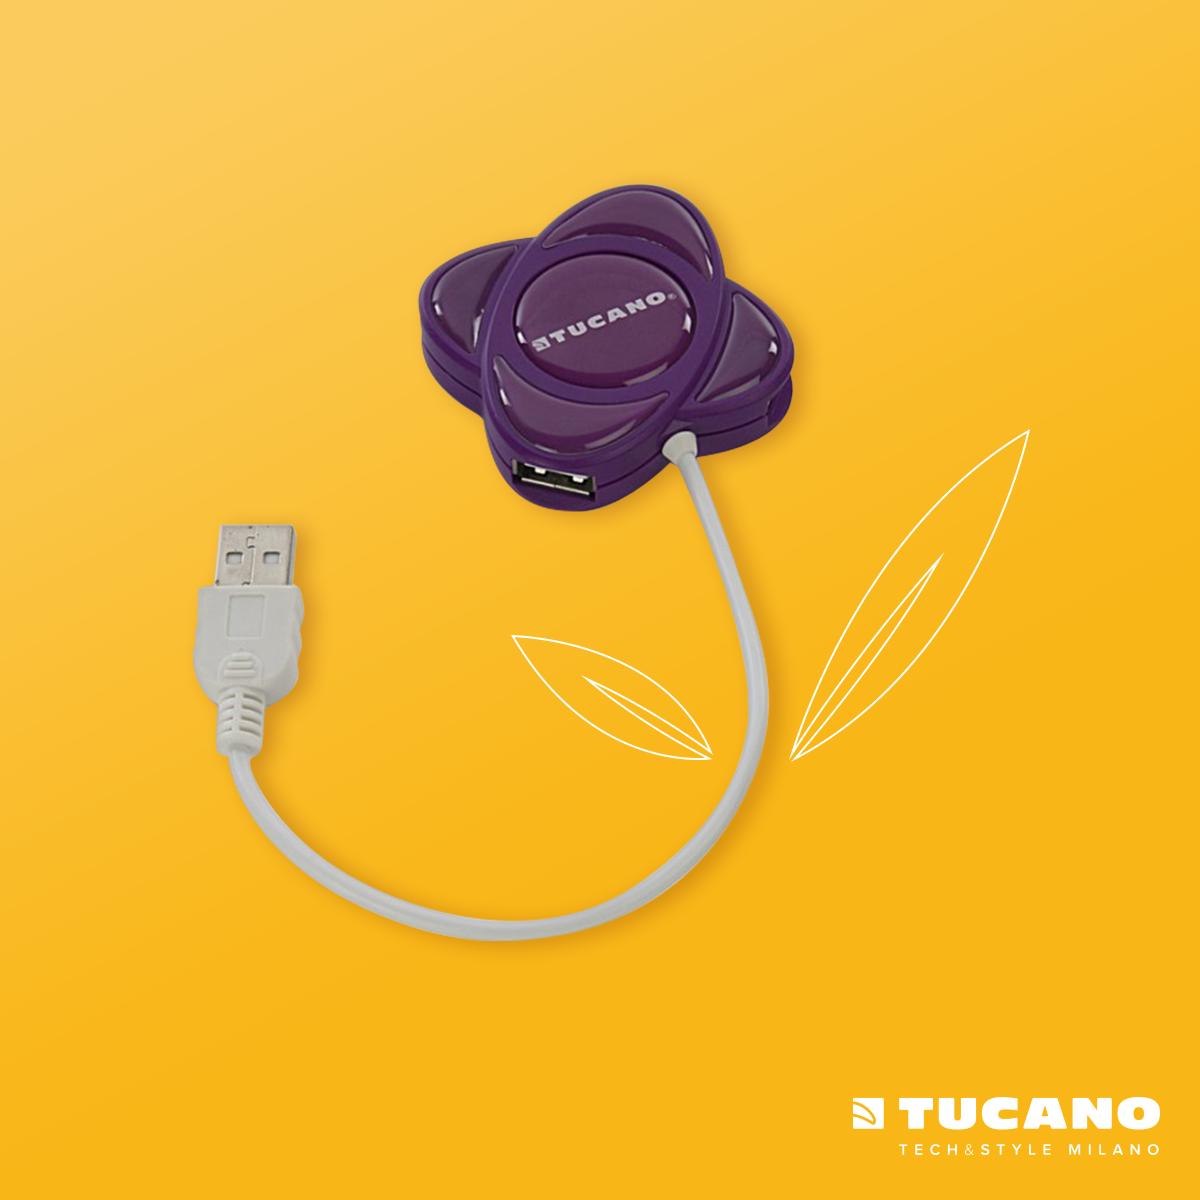 tucanoprove_v4_05b